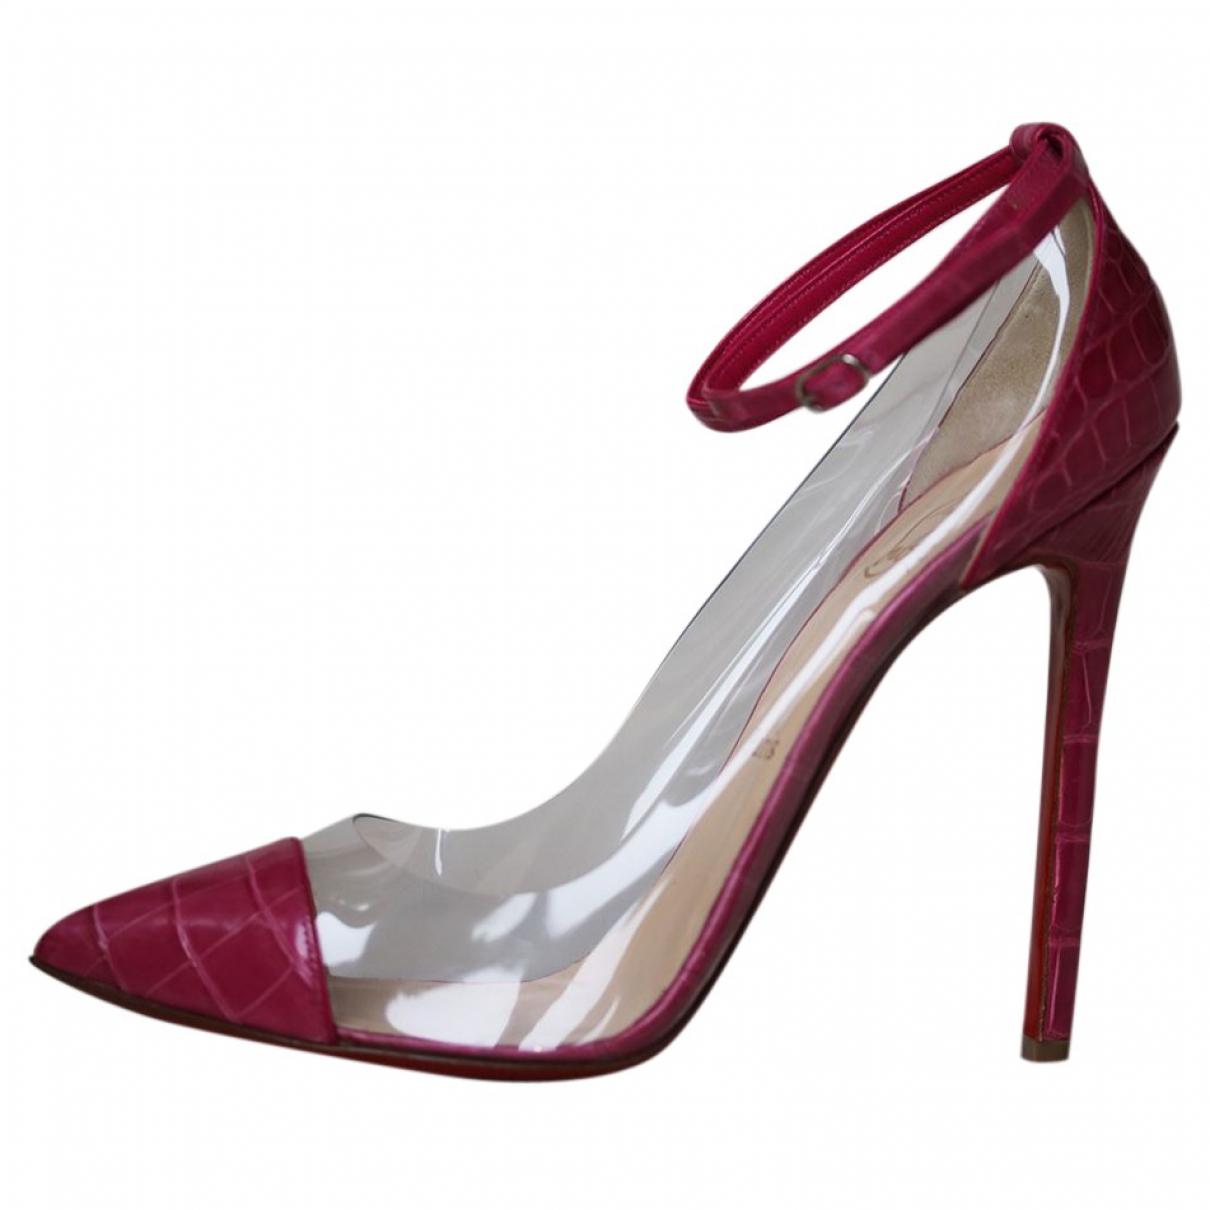 Christian Louboutin N Pink Exotic leathers Heels for Women 37.5 EU